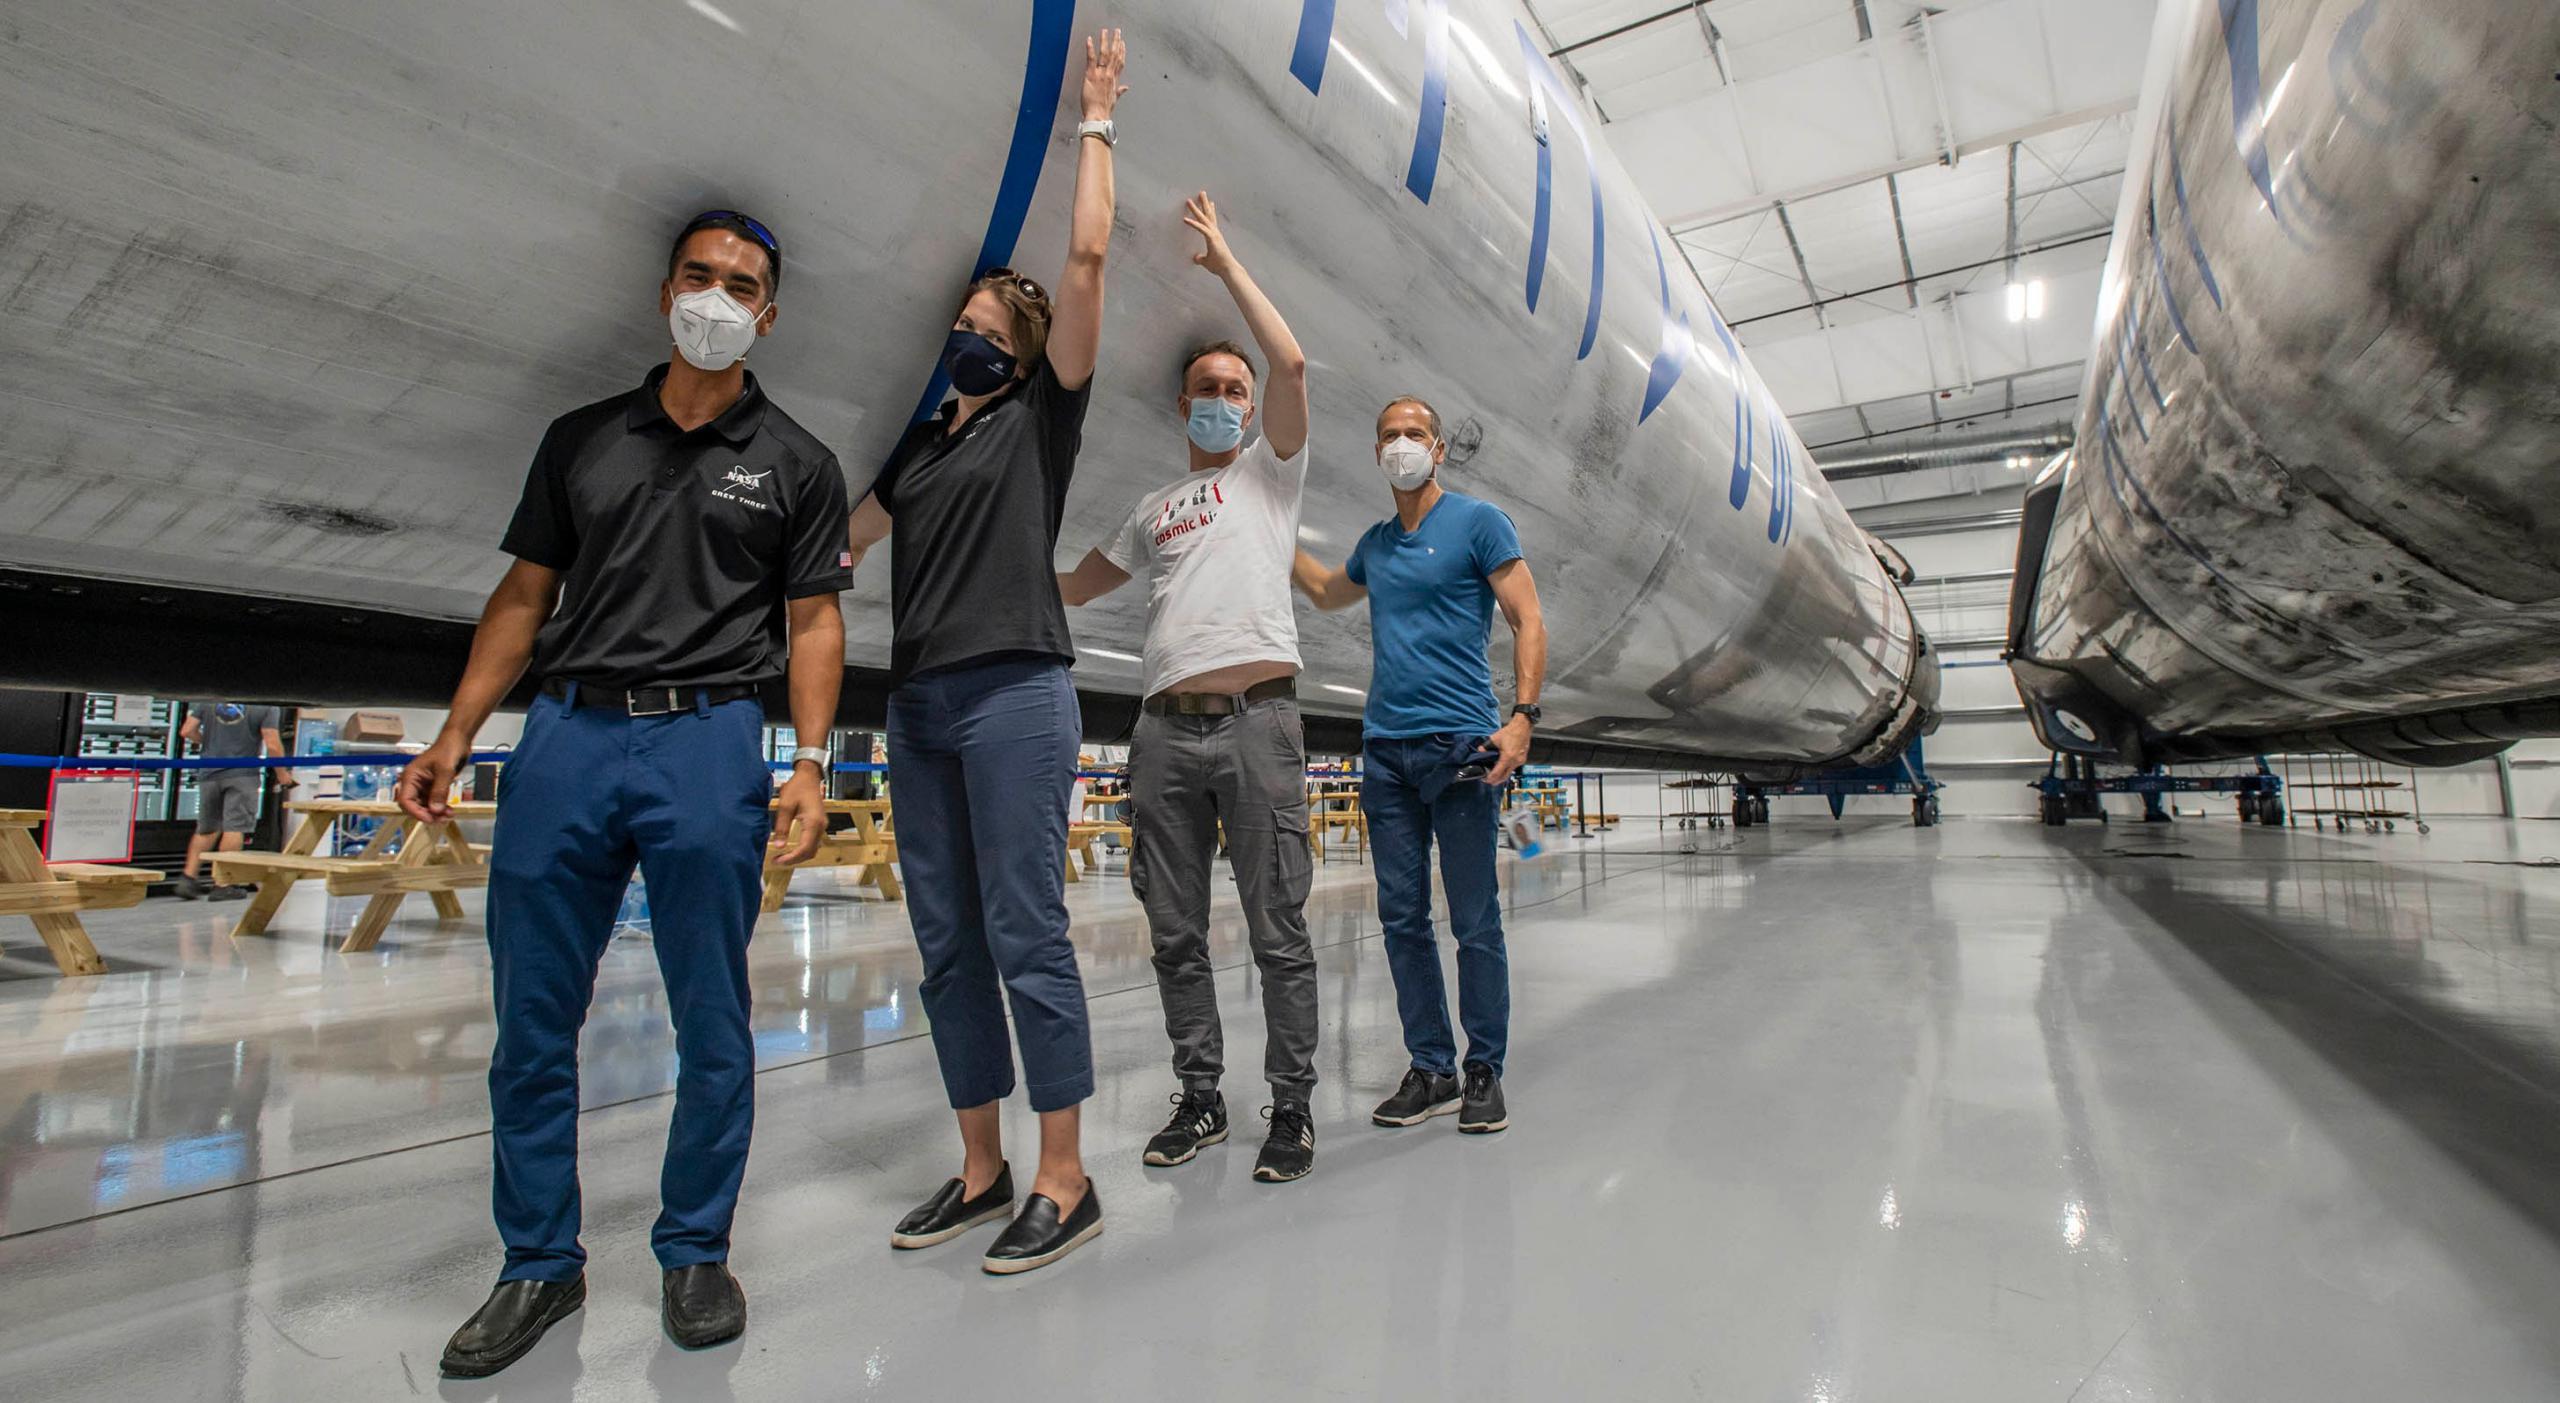 Crew Dragon Crew-3 (SpaceX) Chari Marshburn Barron Maurer HangarX F9 1 crop (c)